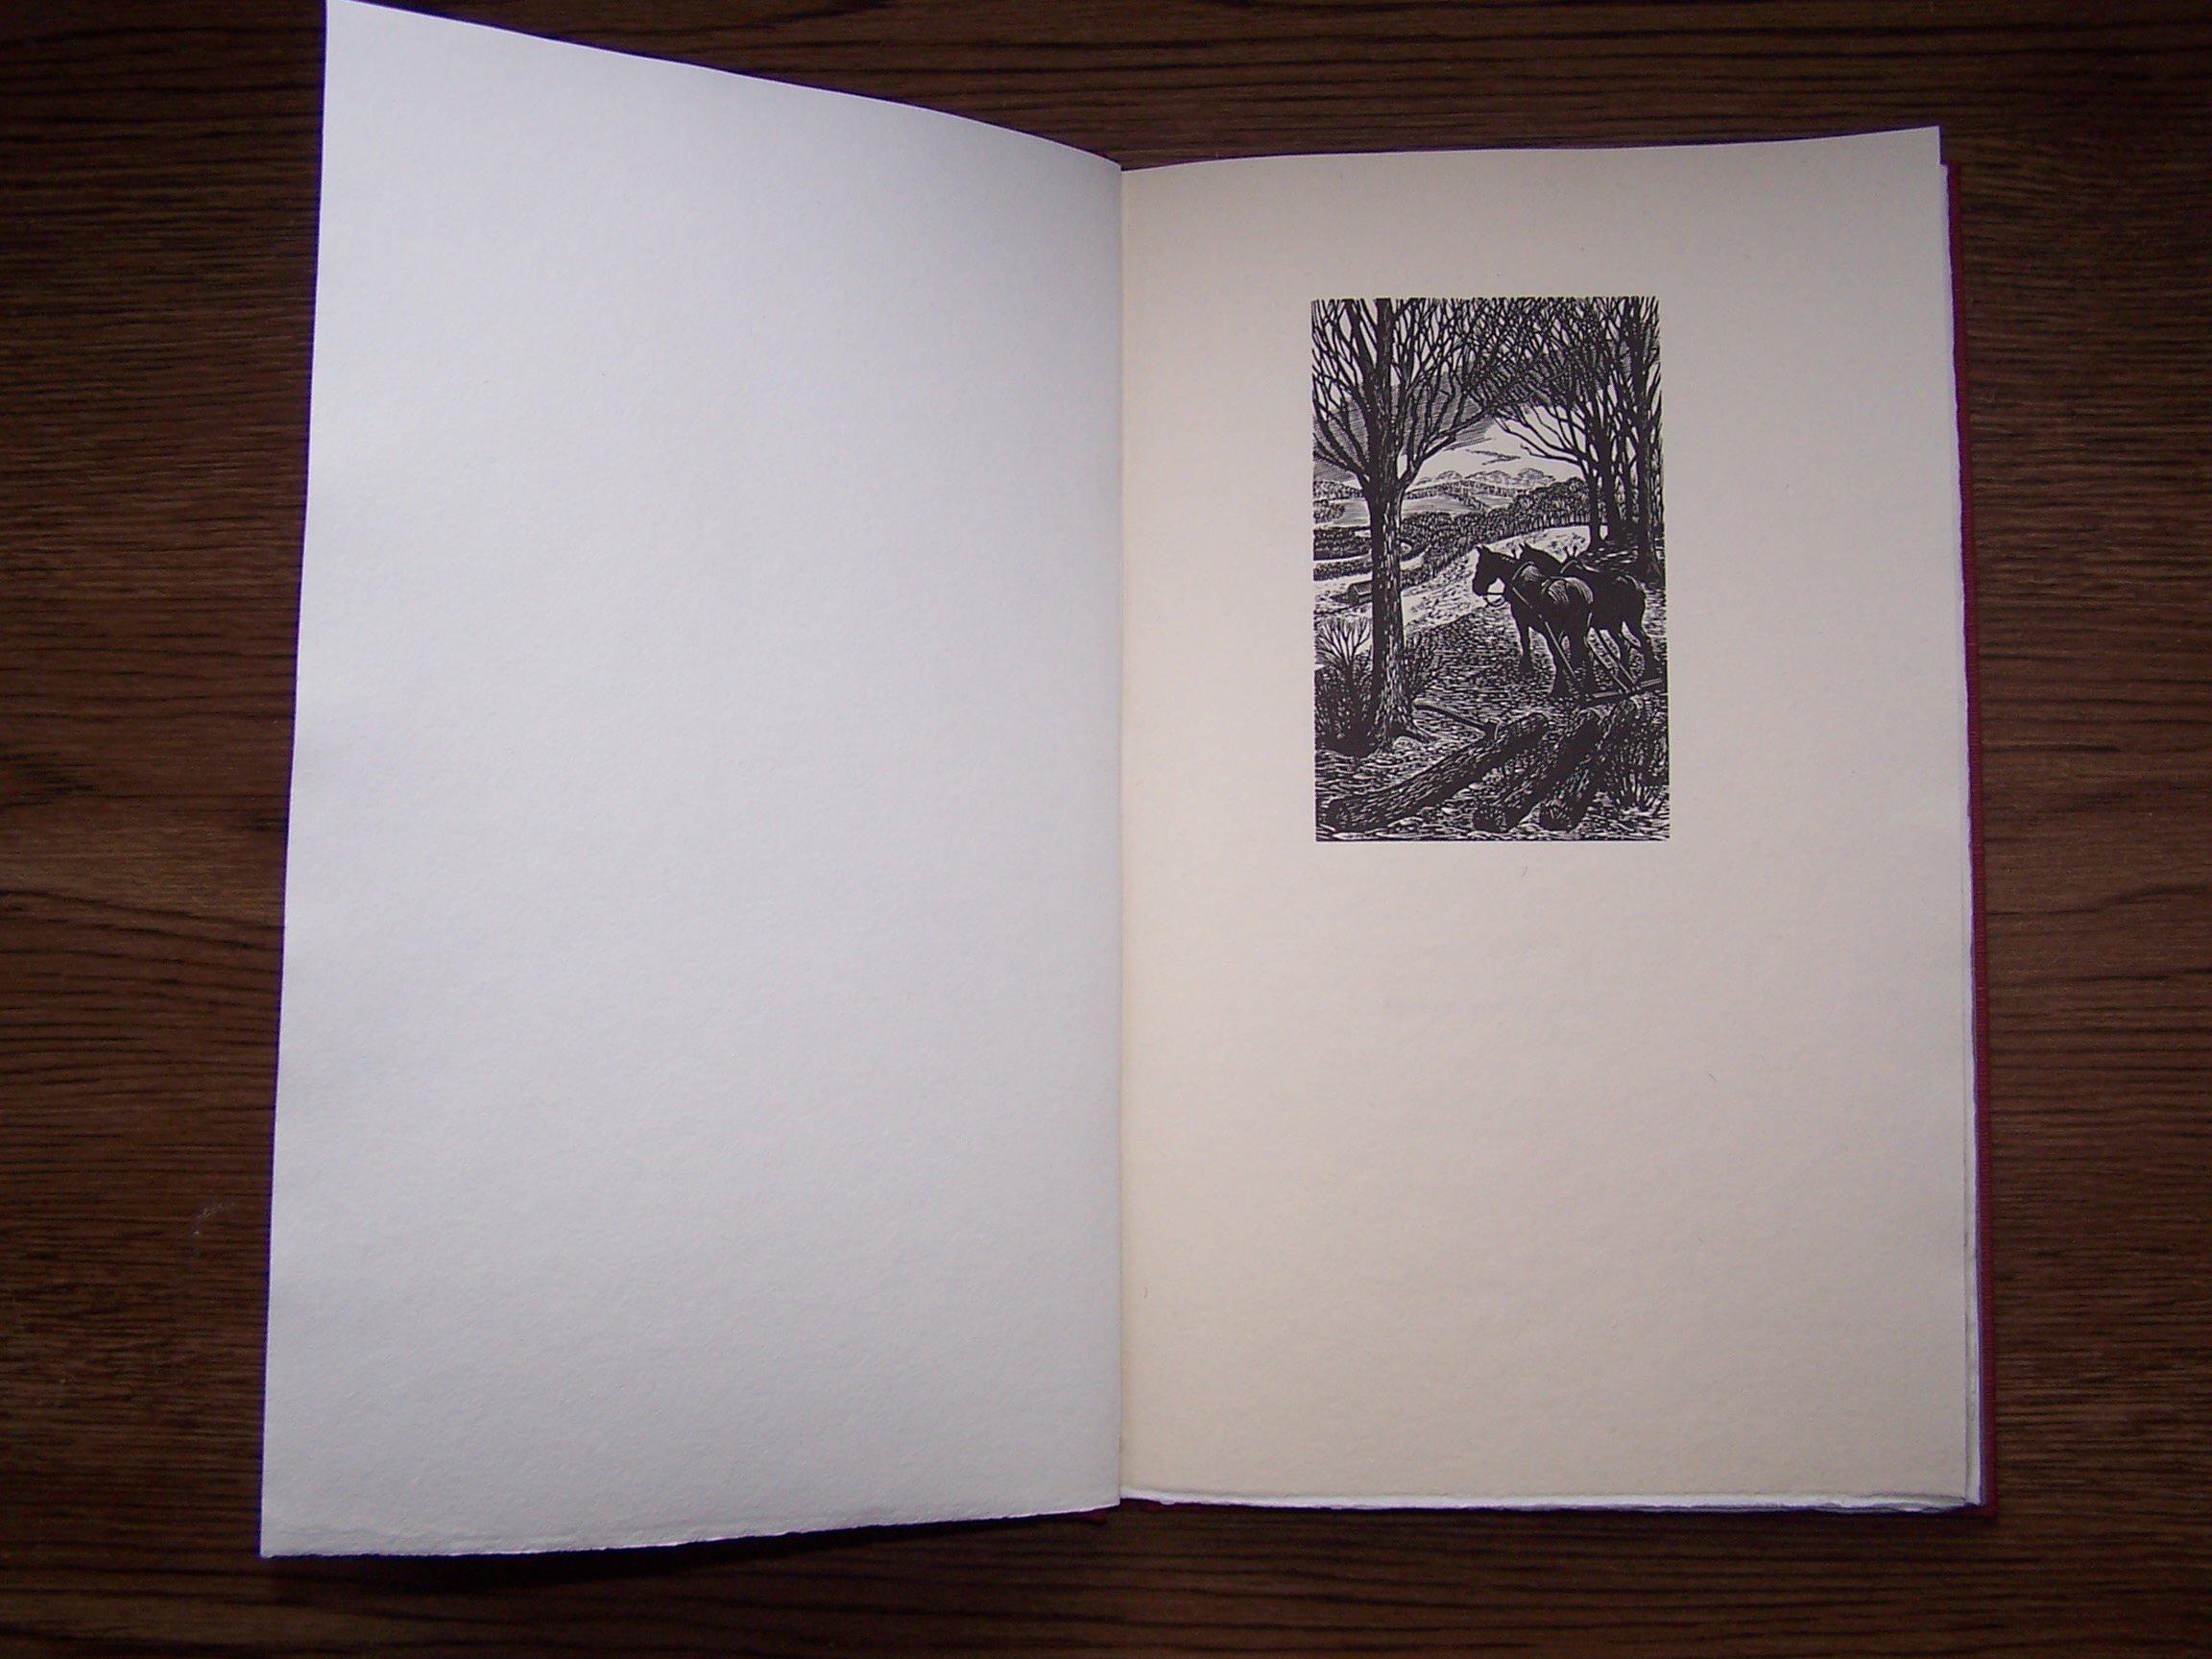 bobfred_book9_01.JPG